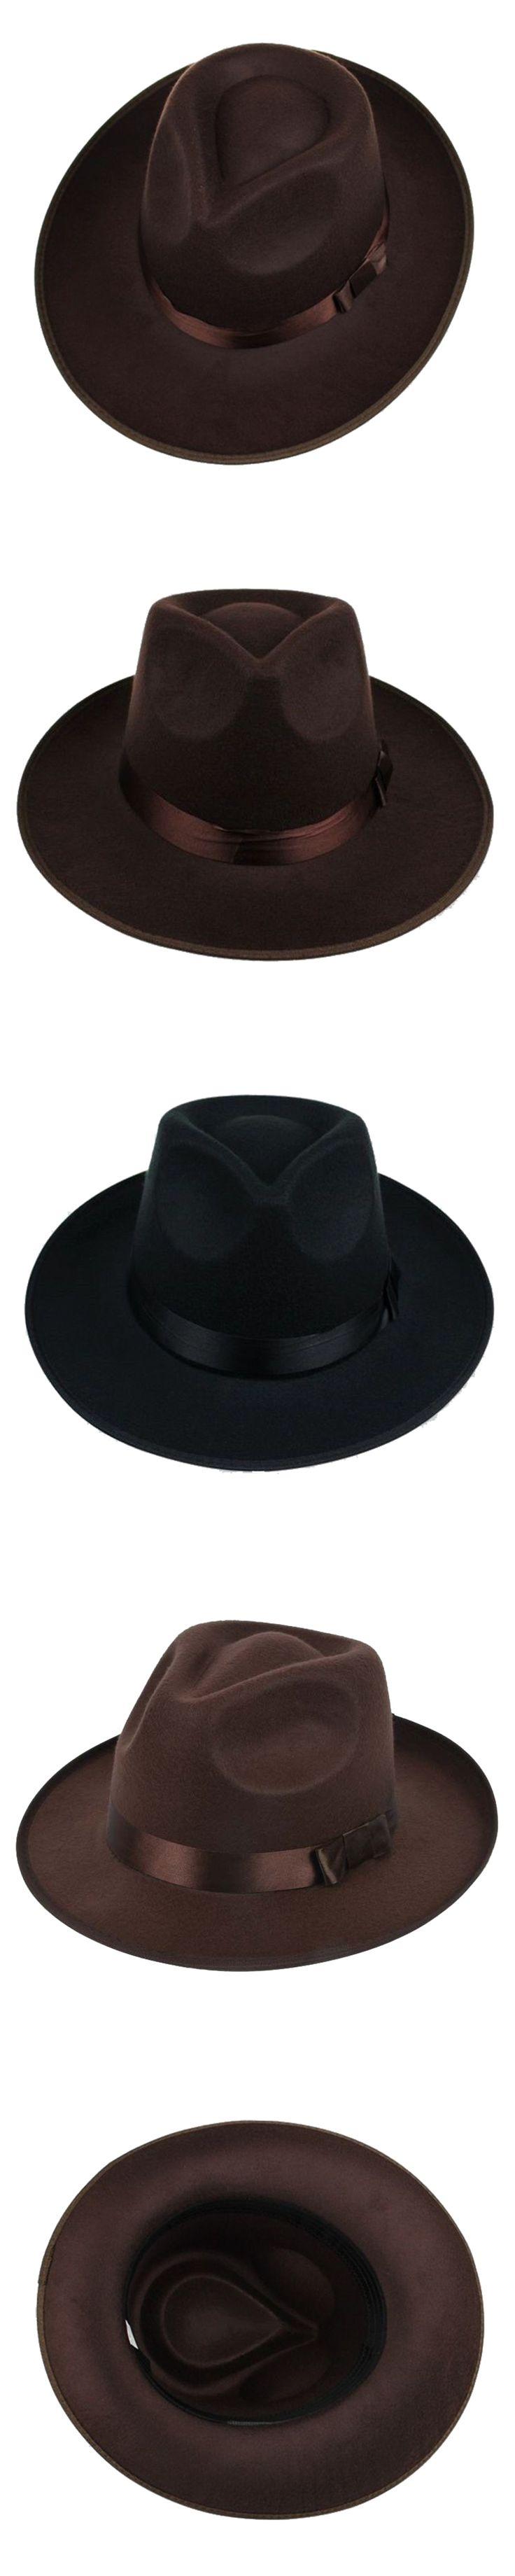 unisex men women hats caps panama fedora trilby straight wide brim hard felt coffee gray black